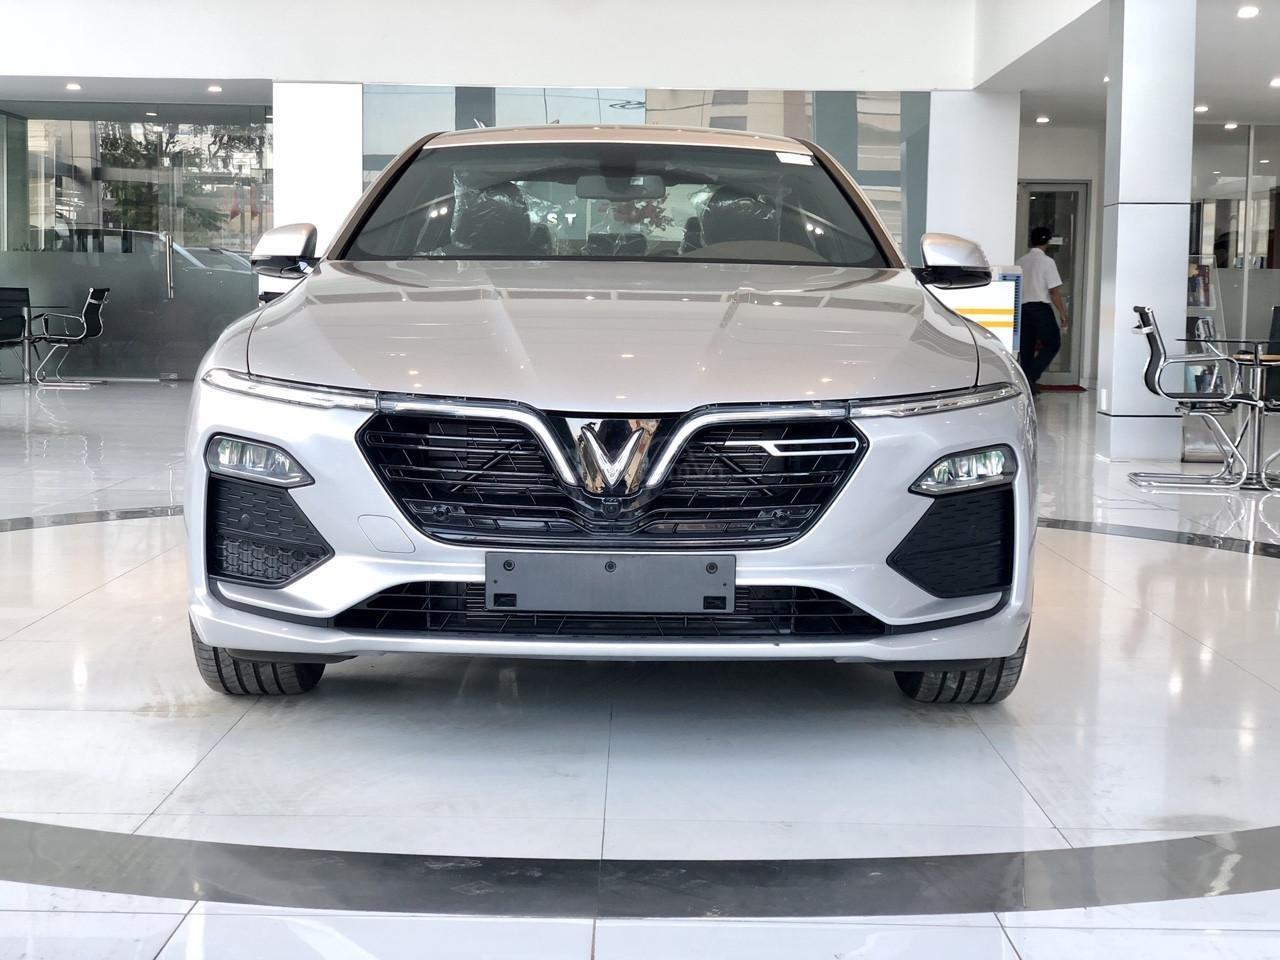 Vinfast - Chevrolet An Thái (10)